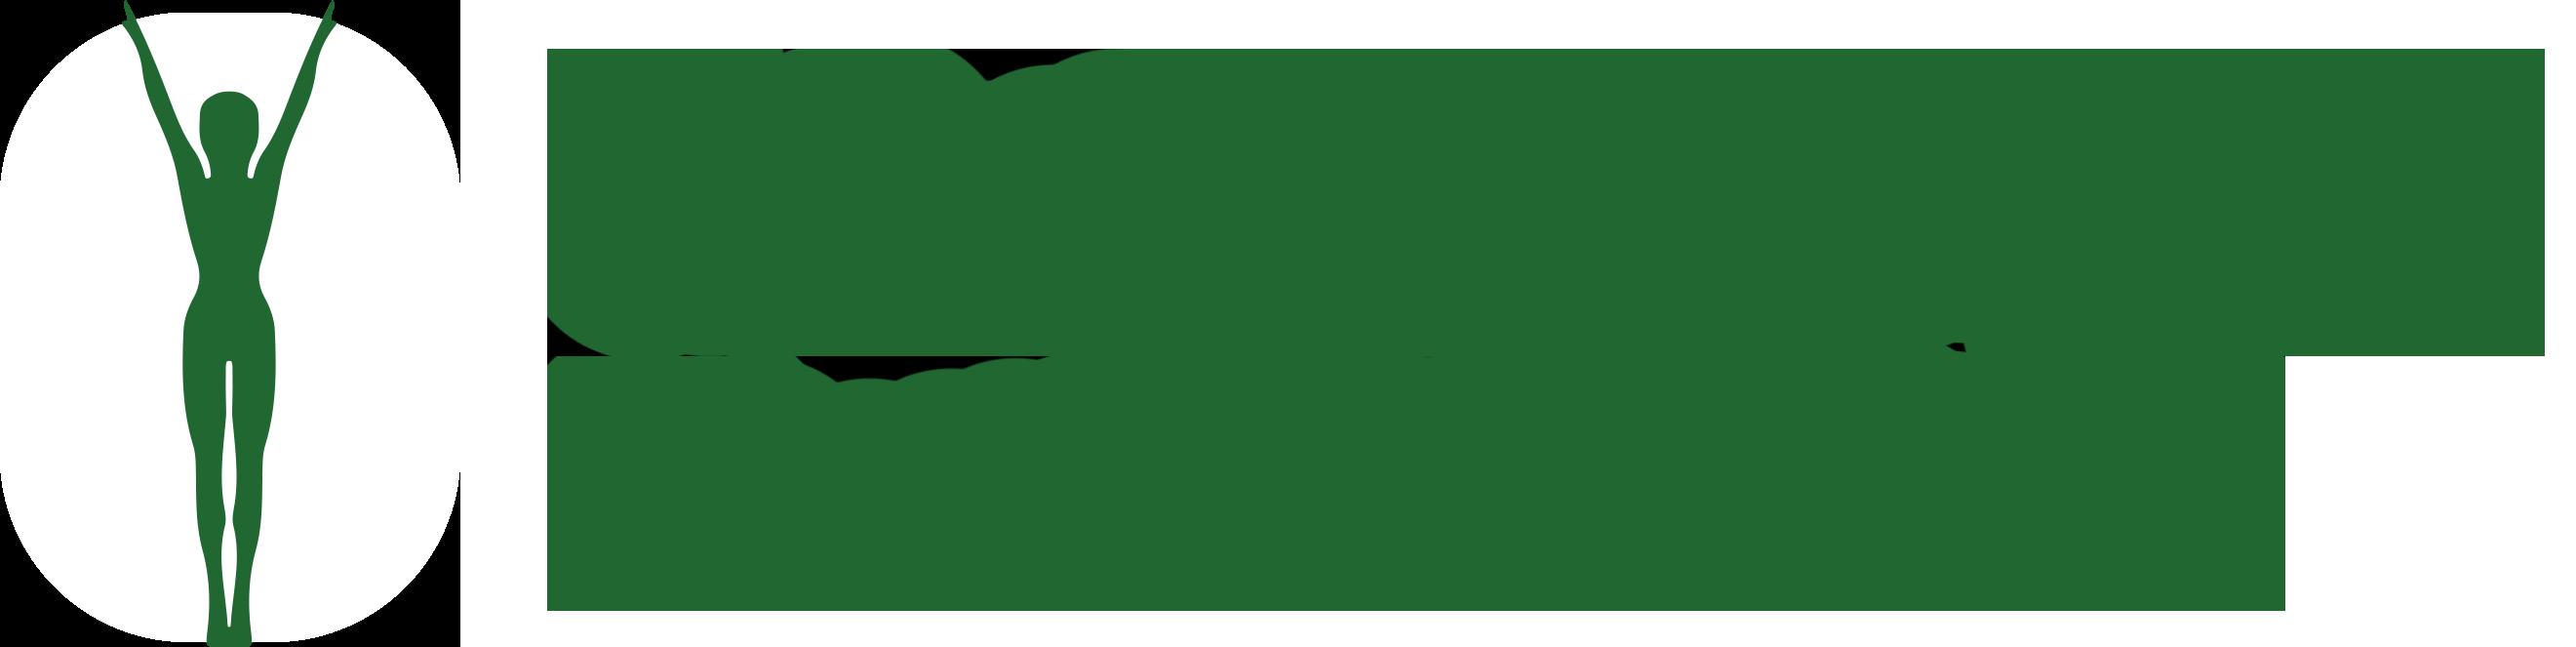 https://backandbodycareclinic.co.uk